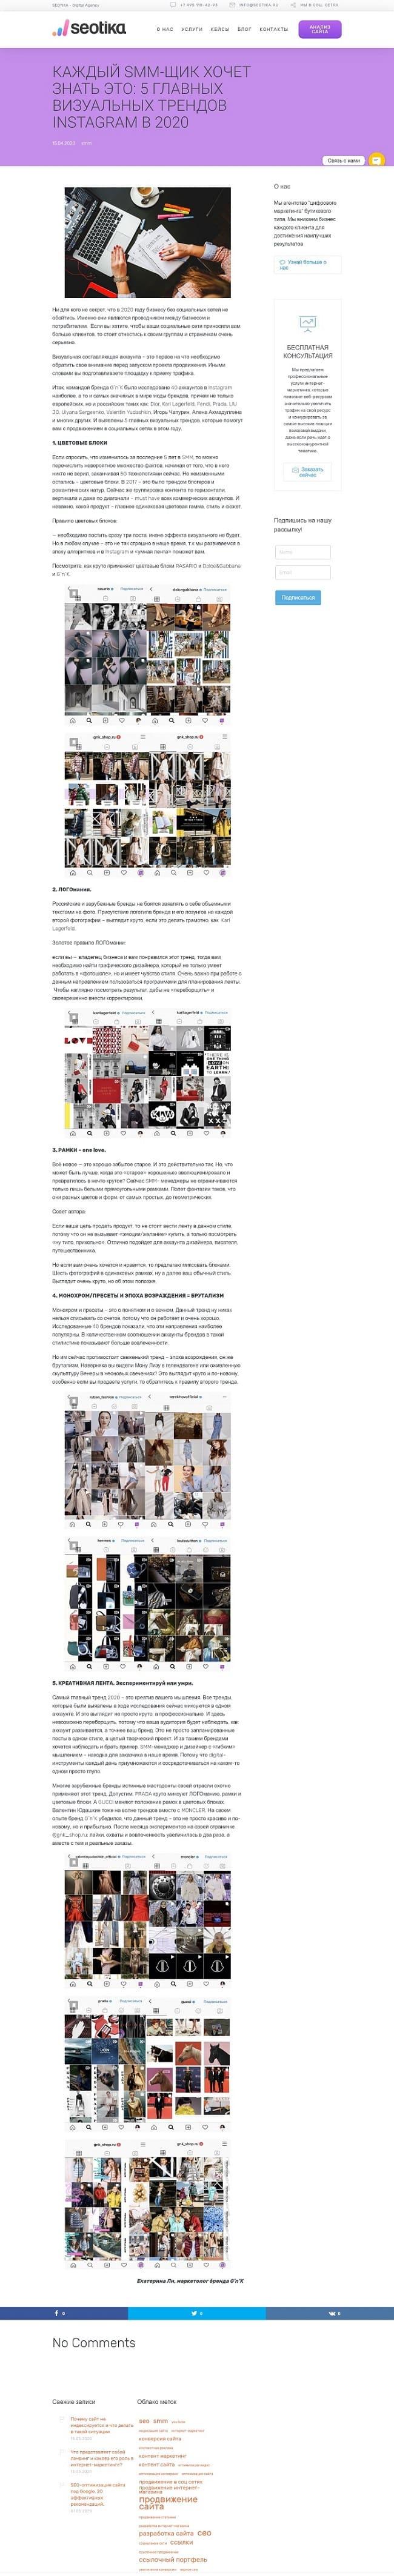 Digital агентство SEOTIKA опубликовала в своём блоге исследование от G'n'K